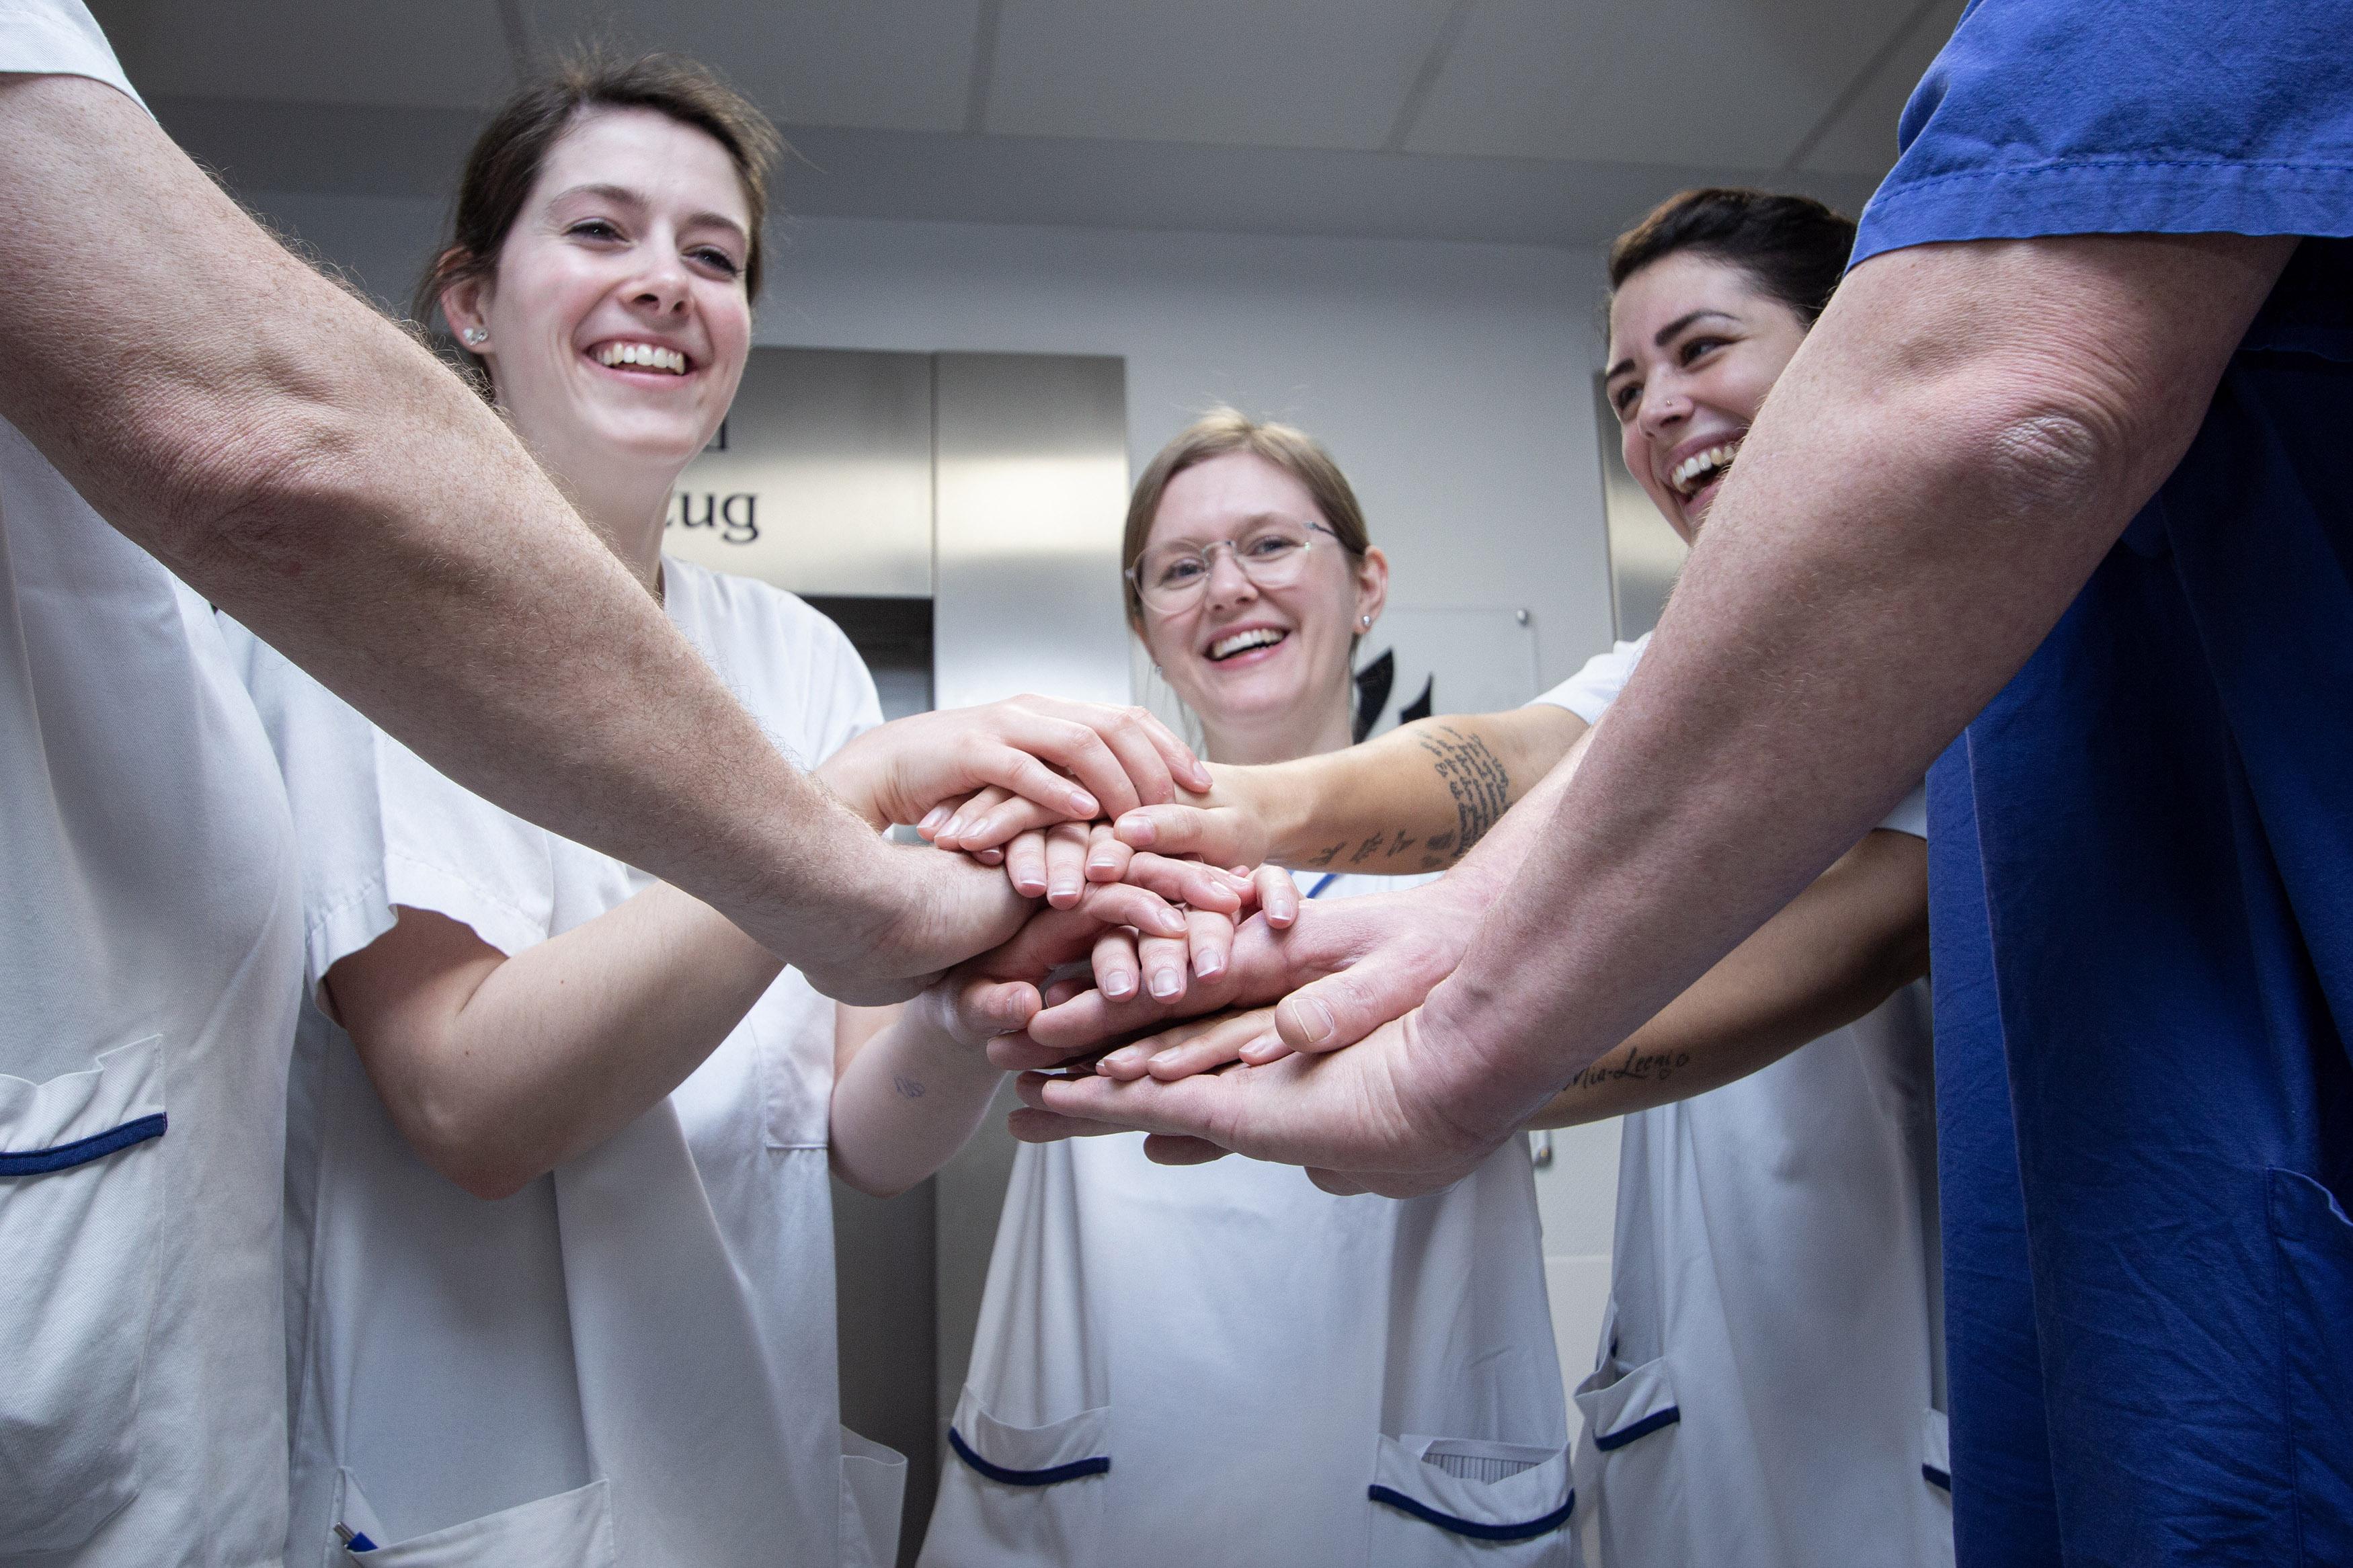 teamwork_9742.jpg – Ubbo-Emmius-Klinik